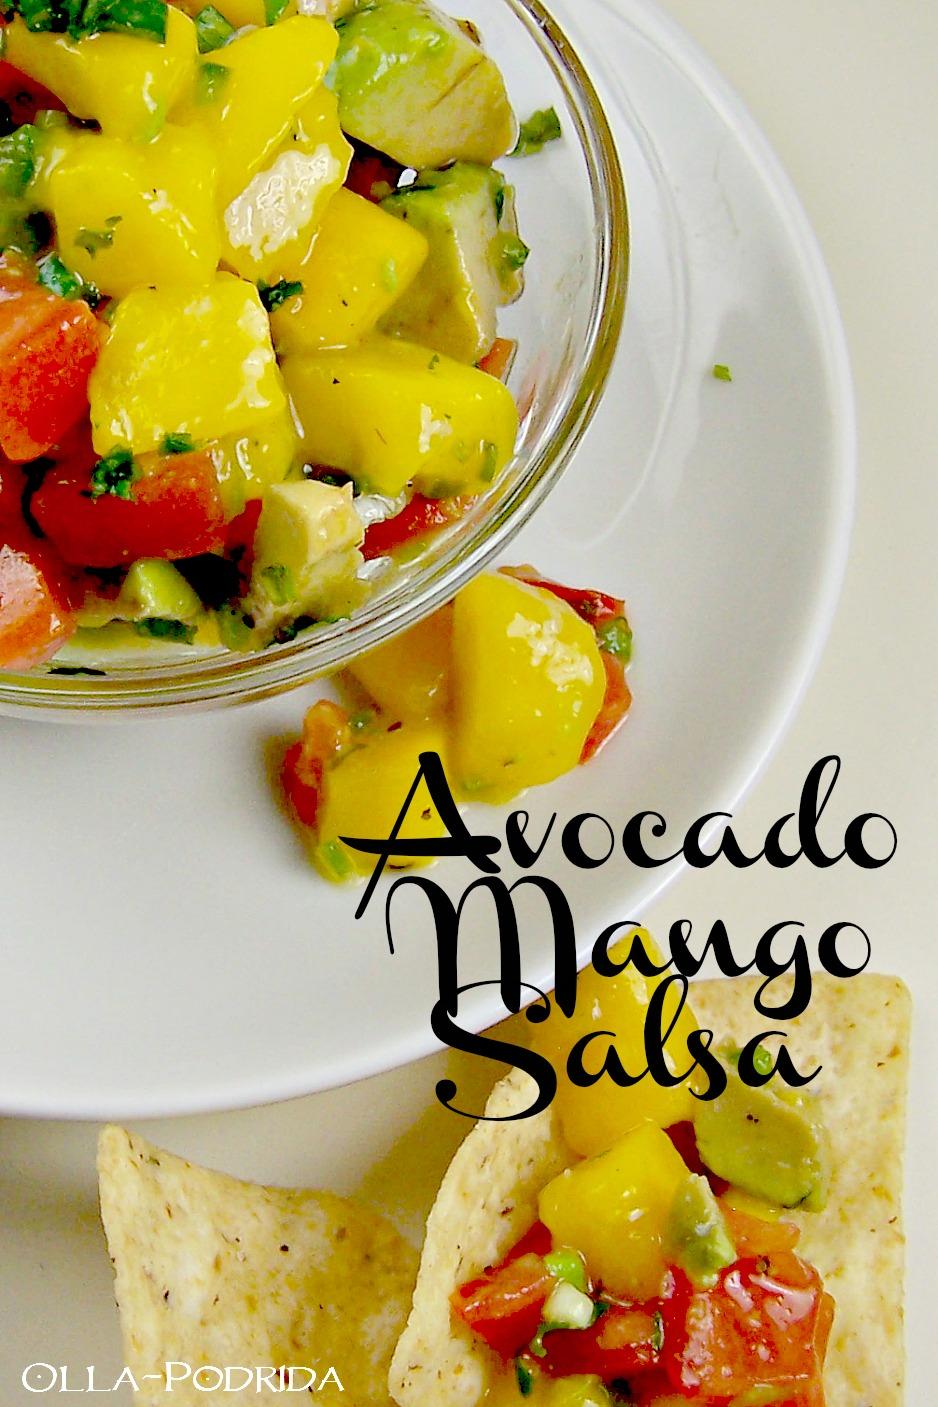 Olla-Podrida: Avocado Mango Salsa